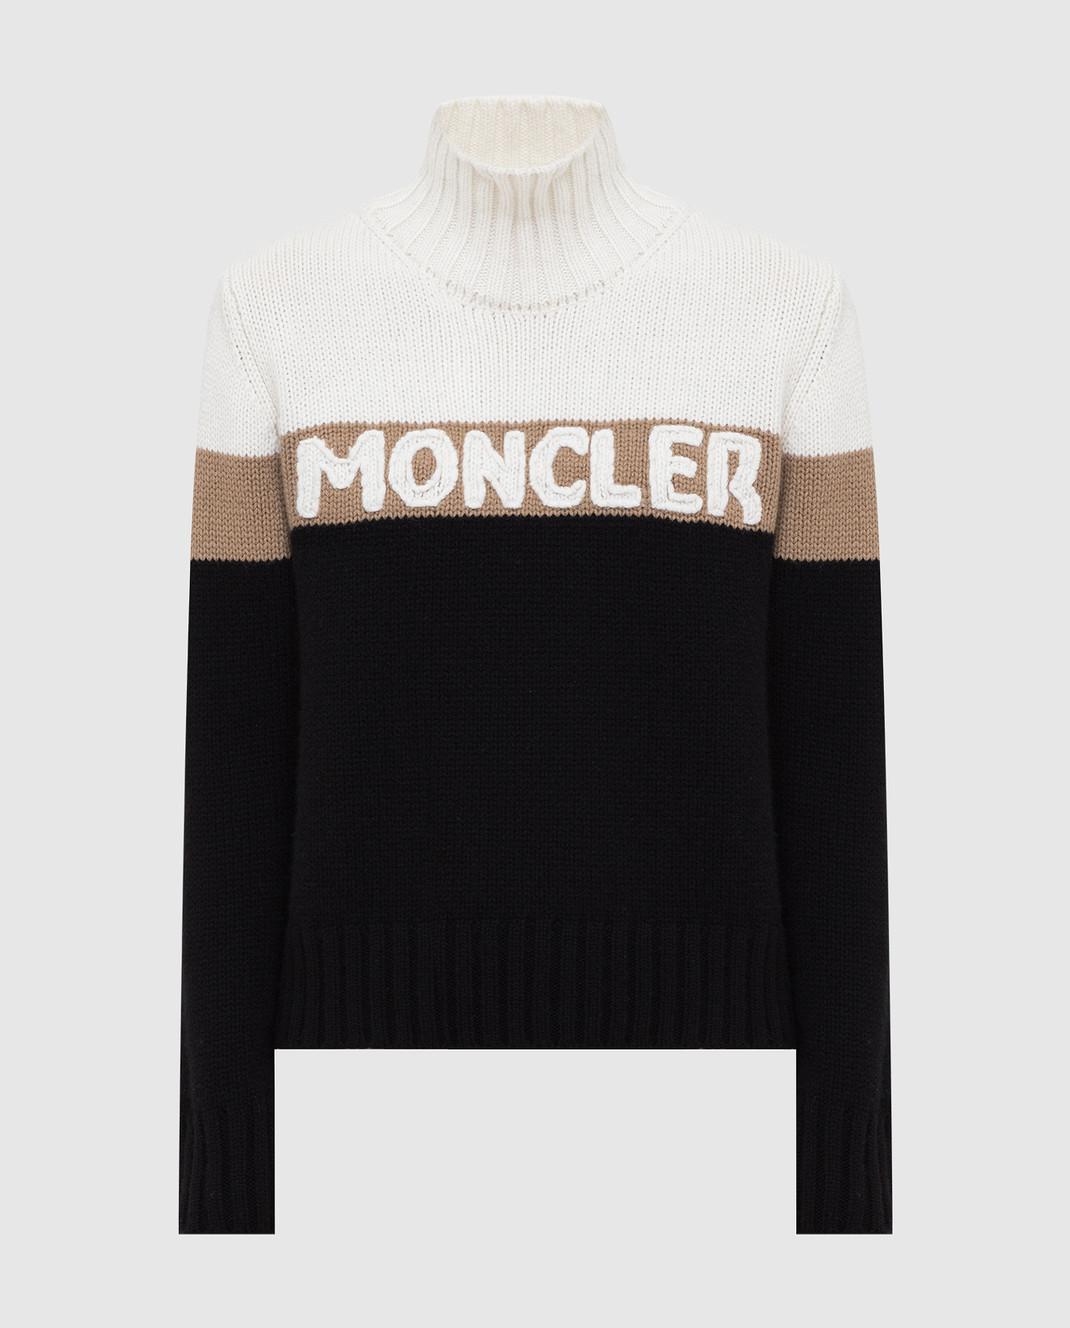 Moncler Свитер из шерсти и кашемира 9252550A9141